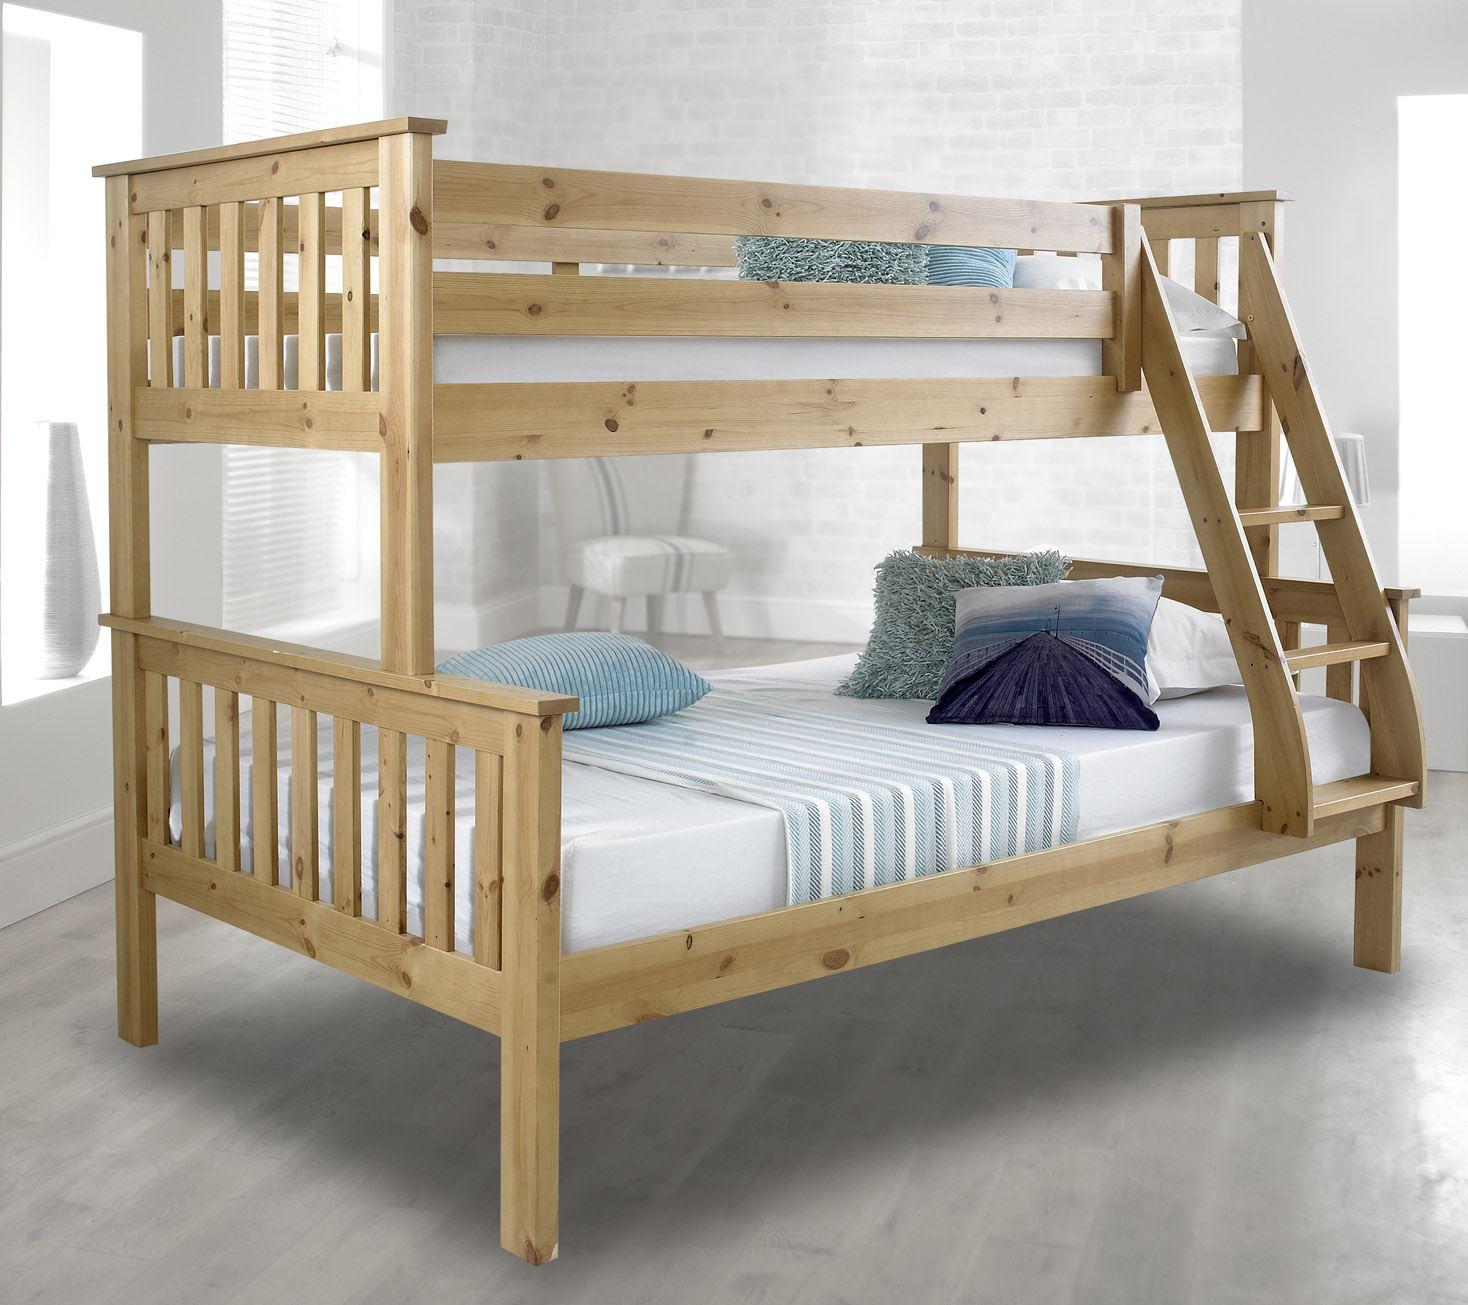 happy beds atlantis solid wood triple sleeper bunk bed 3ft 4ft 2x mattress ebay. Black Bedroom Furniture Sets. Home Design Ideas